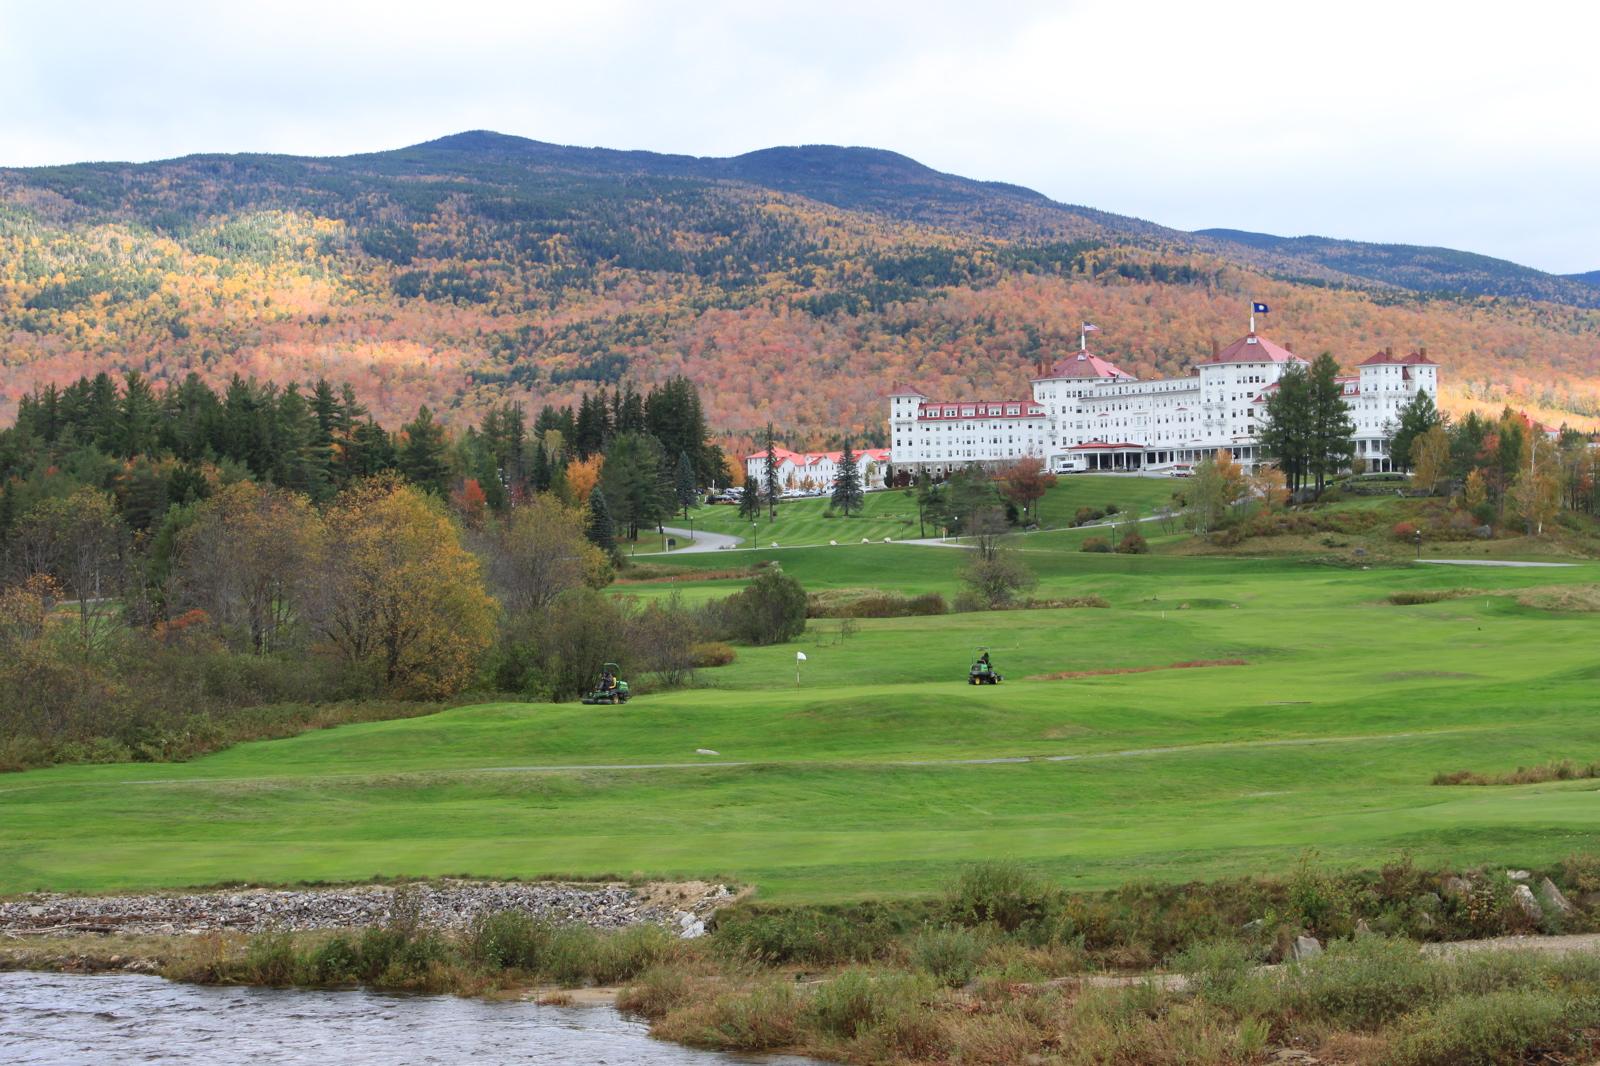 Mount Washington Resort - White Mountains, New Hampshire